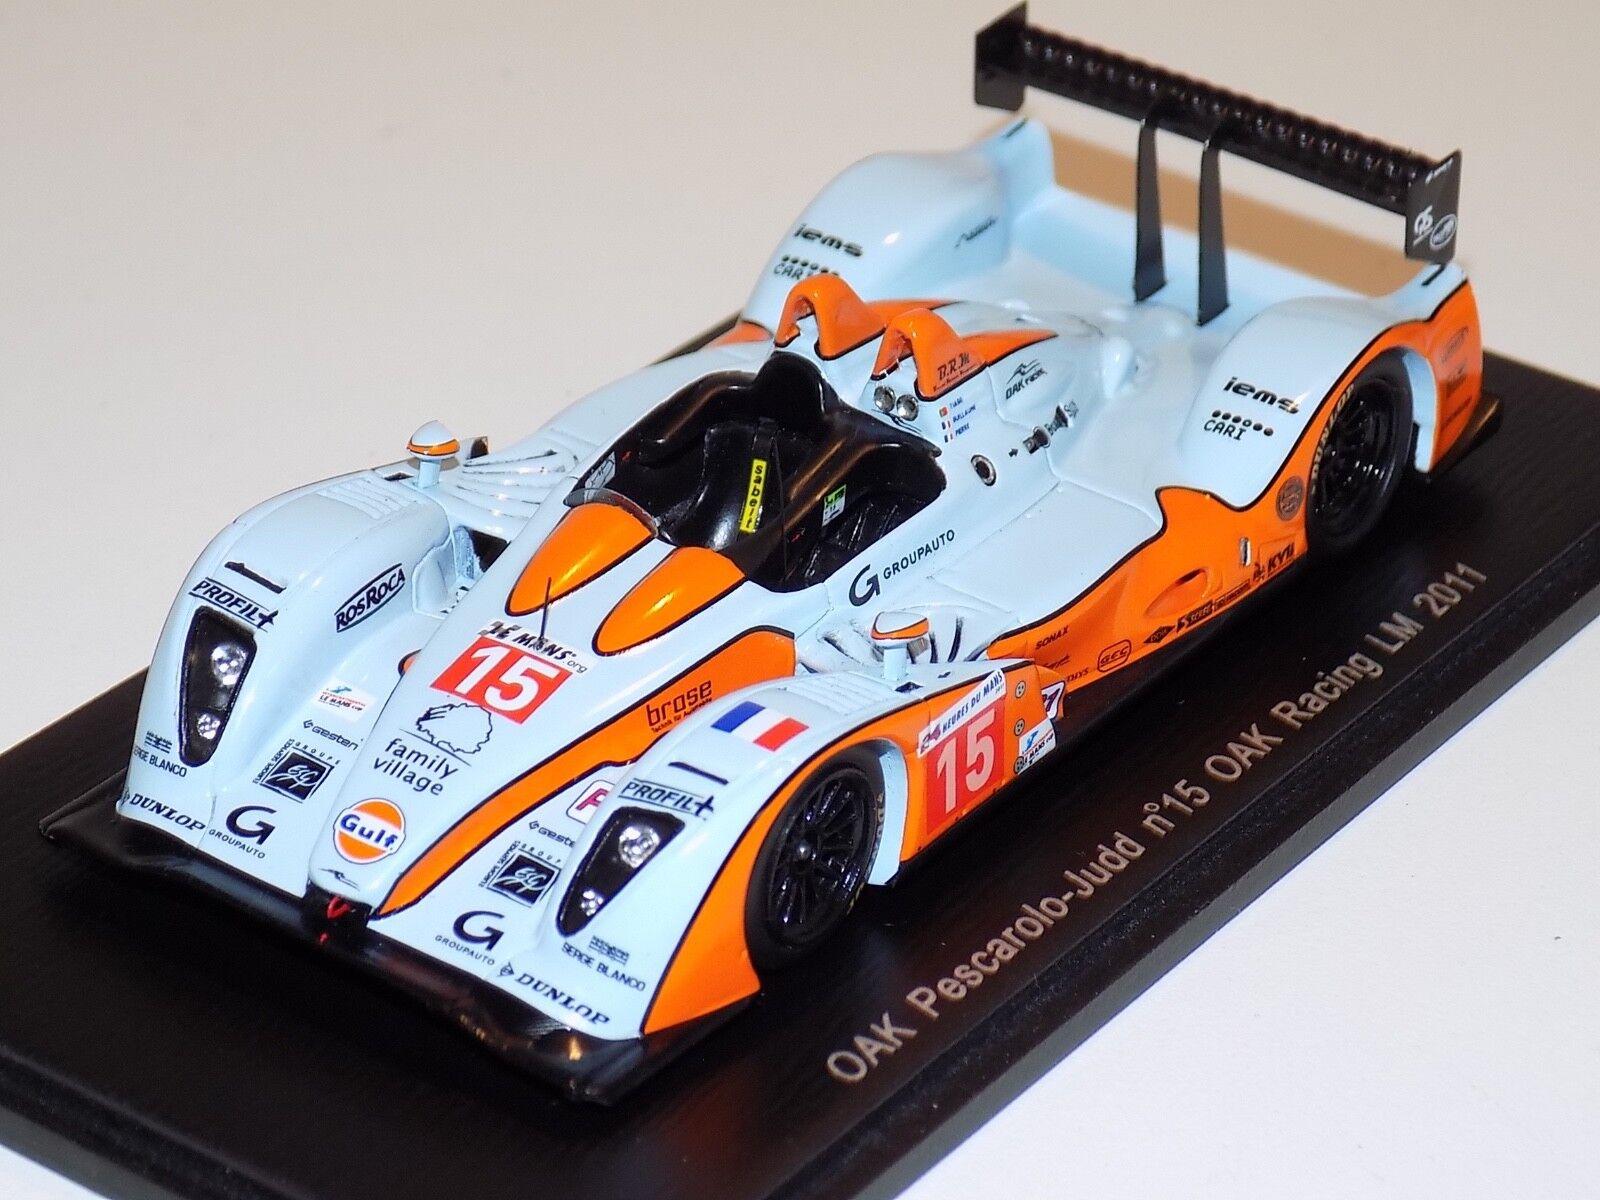 1 43 Spark OAK Pescarolo Judd OAK Racing Car  H of Le Mans  S2523